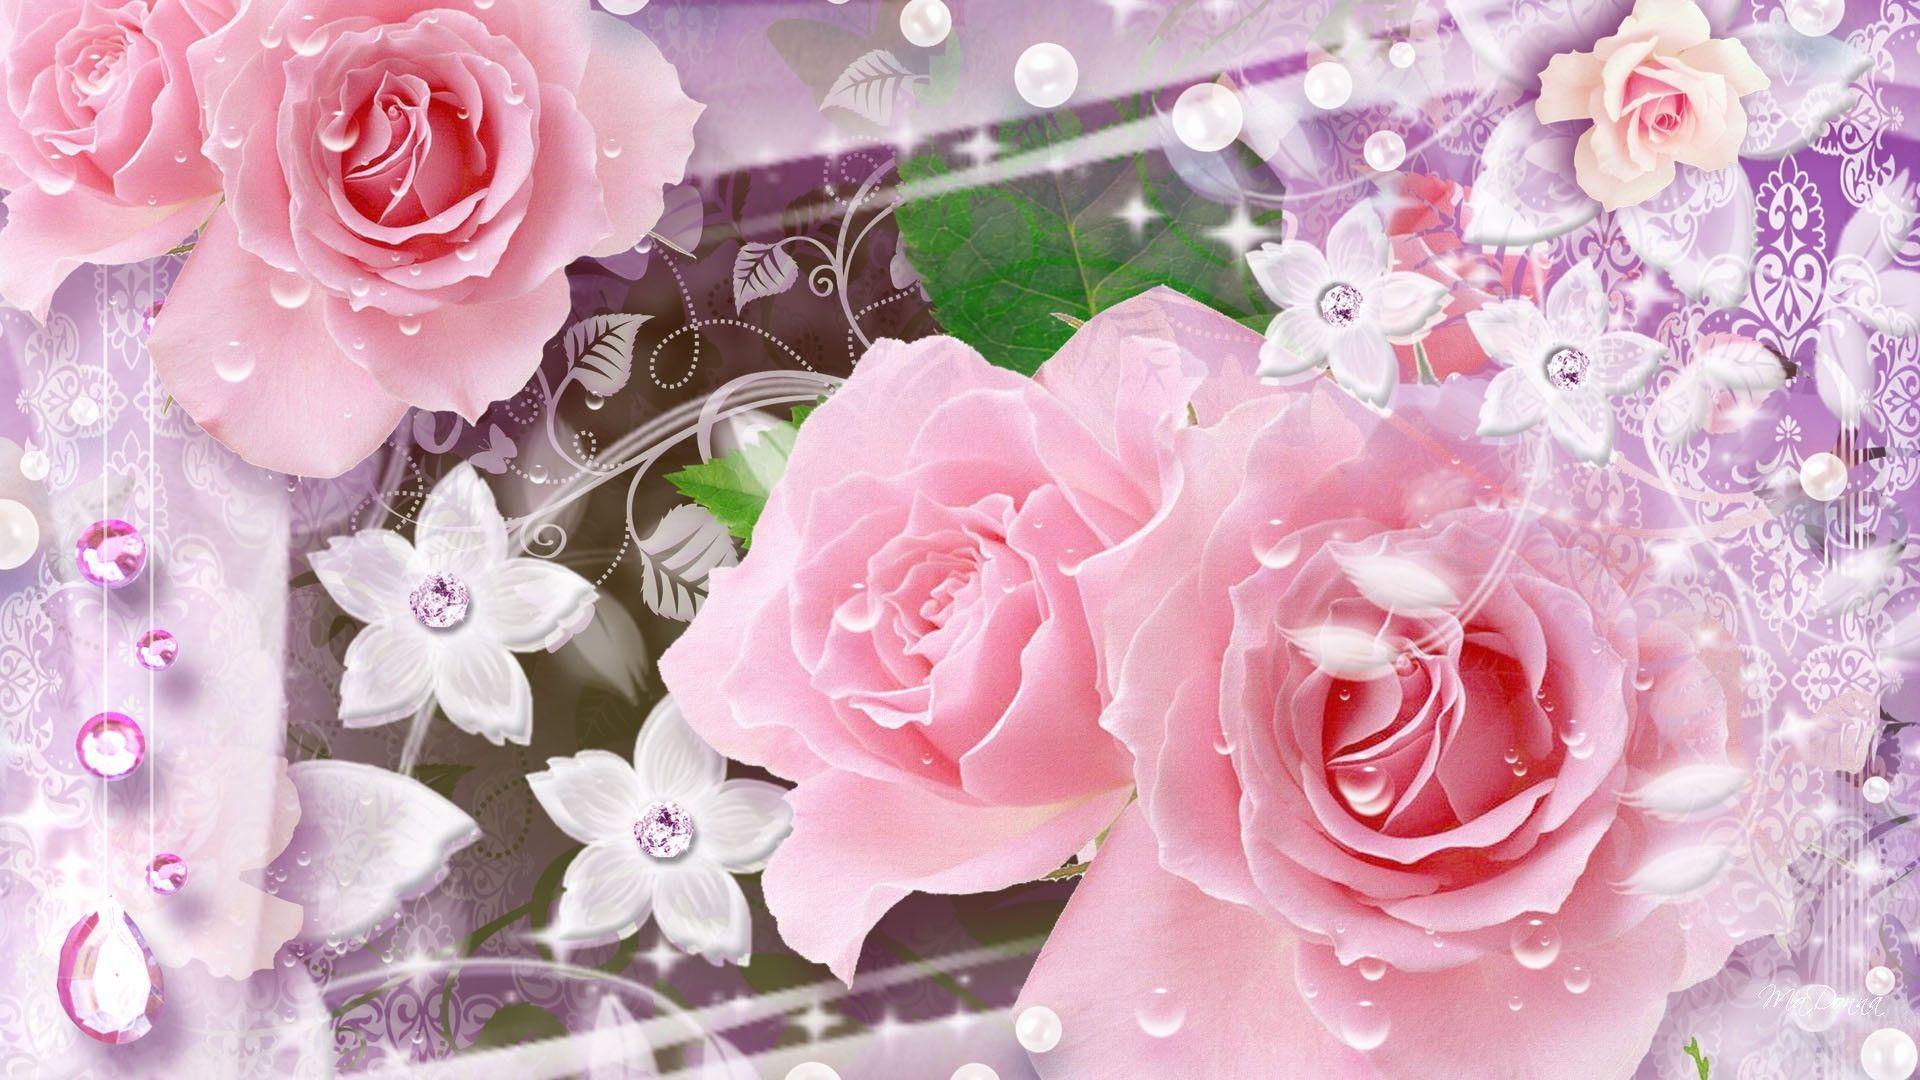 Glitter Flower Wallpapers Wallpaper Cave